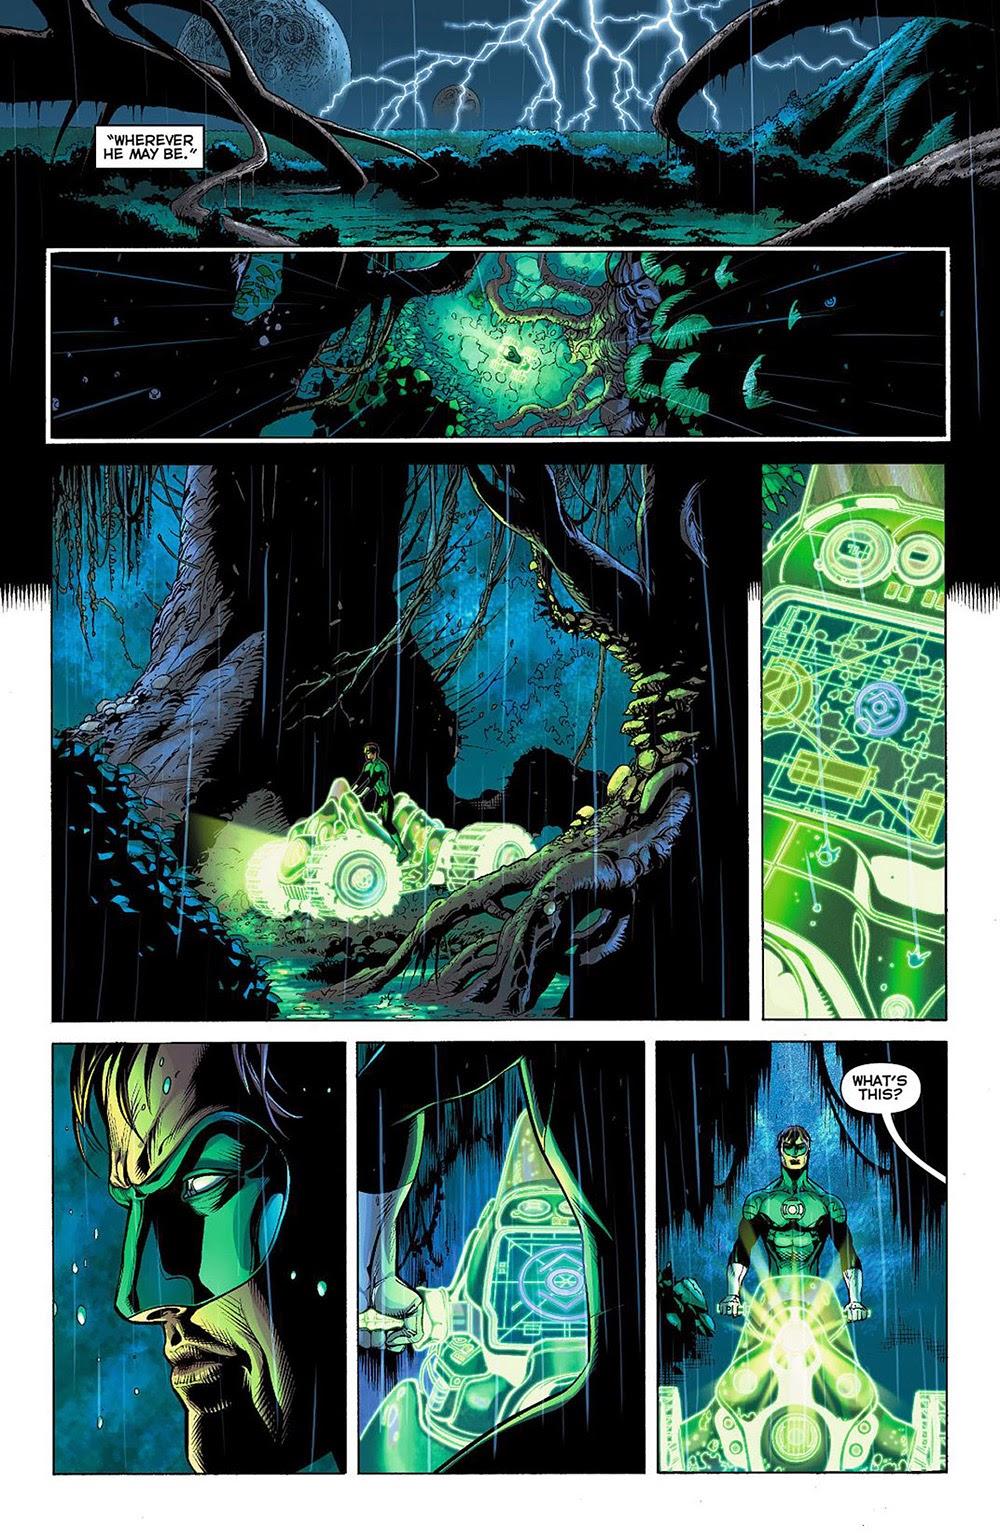 green lantern v5 009 2012 vietcomic net reading comics for free